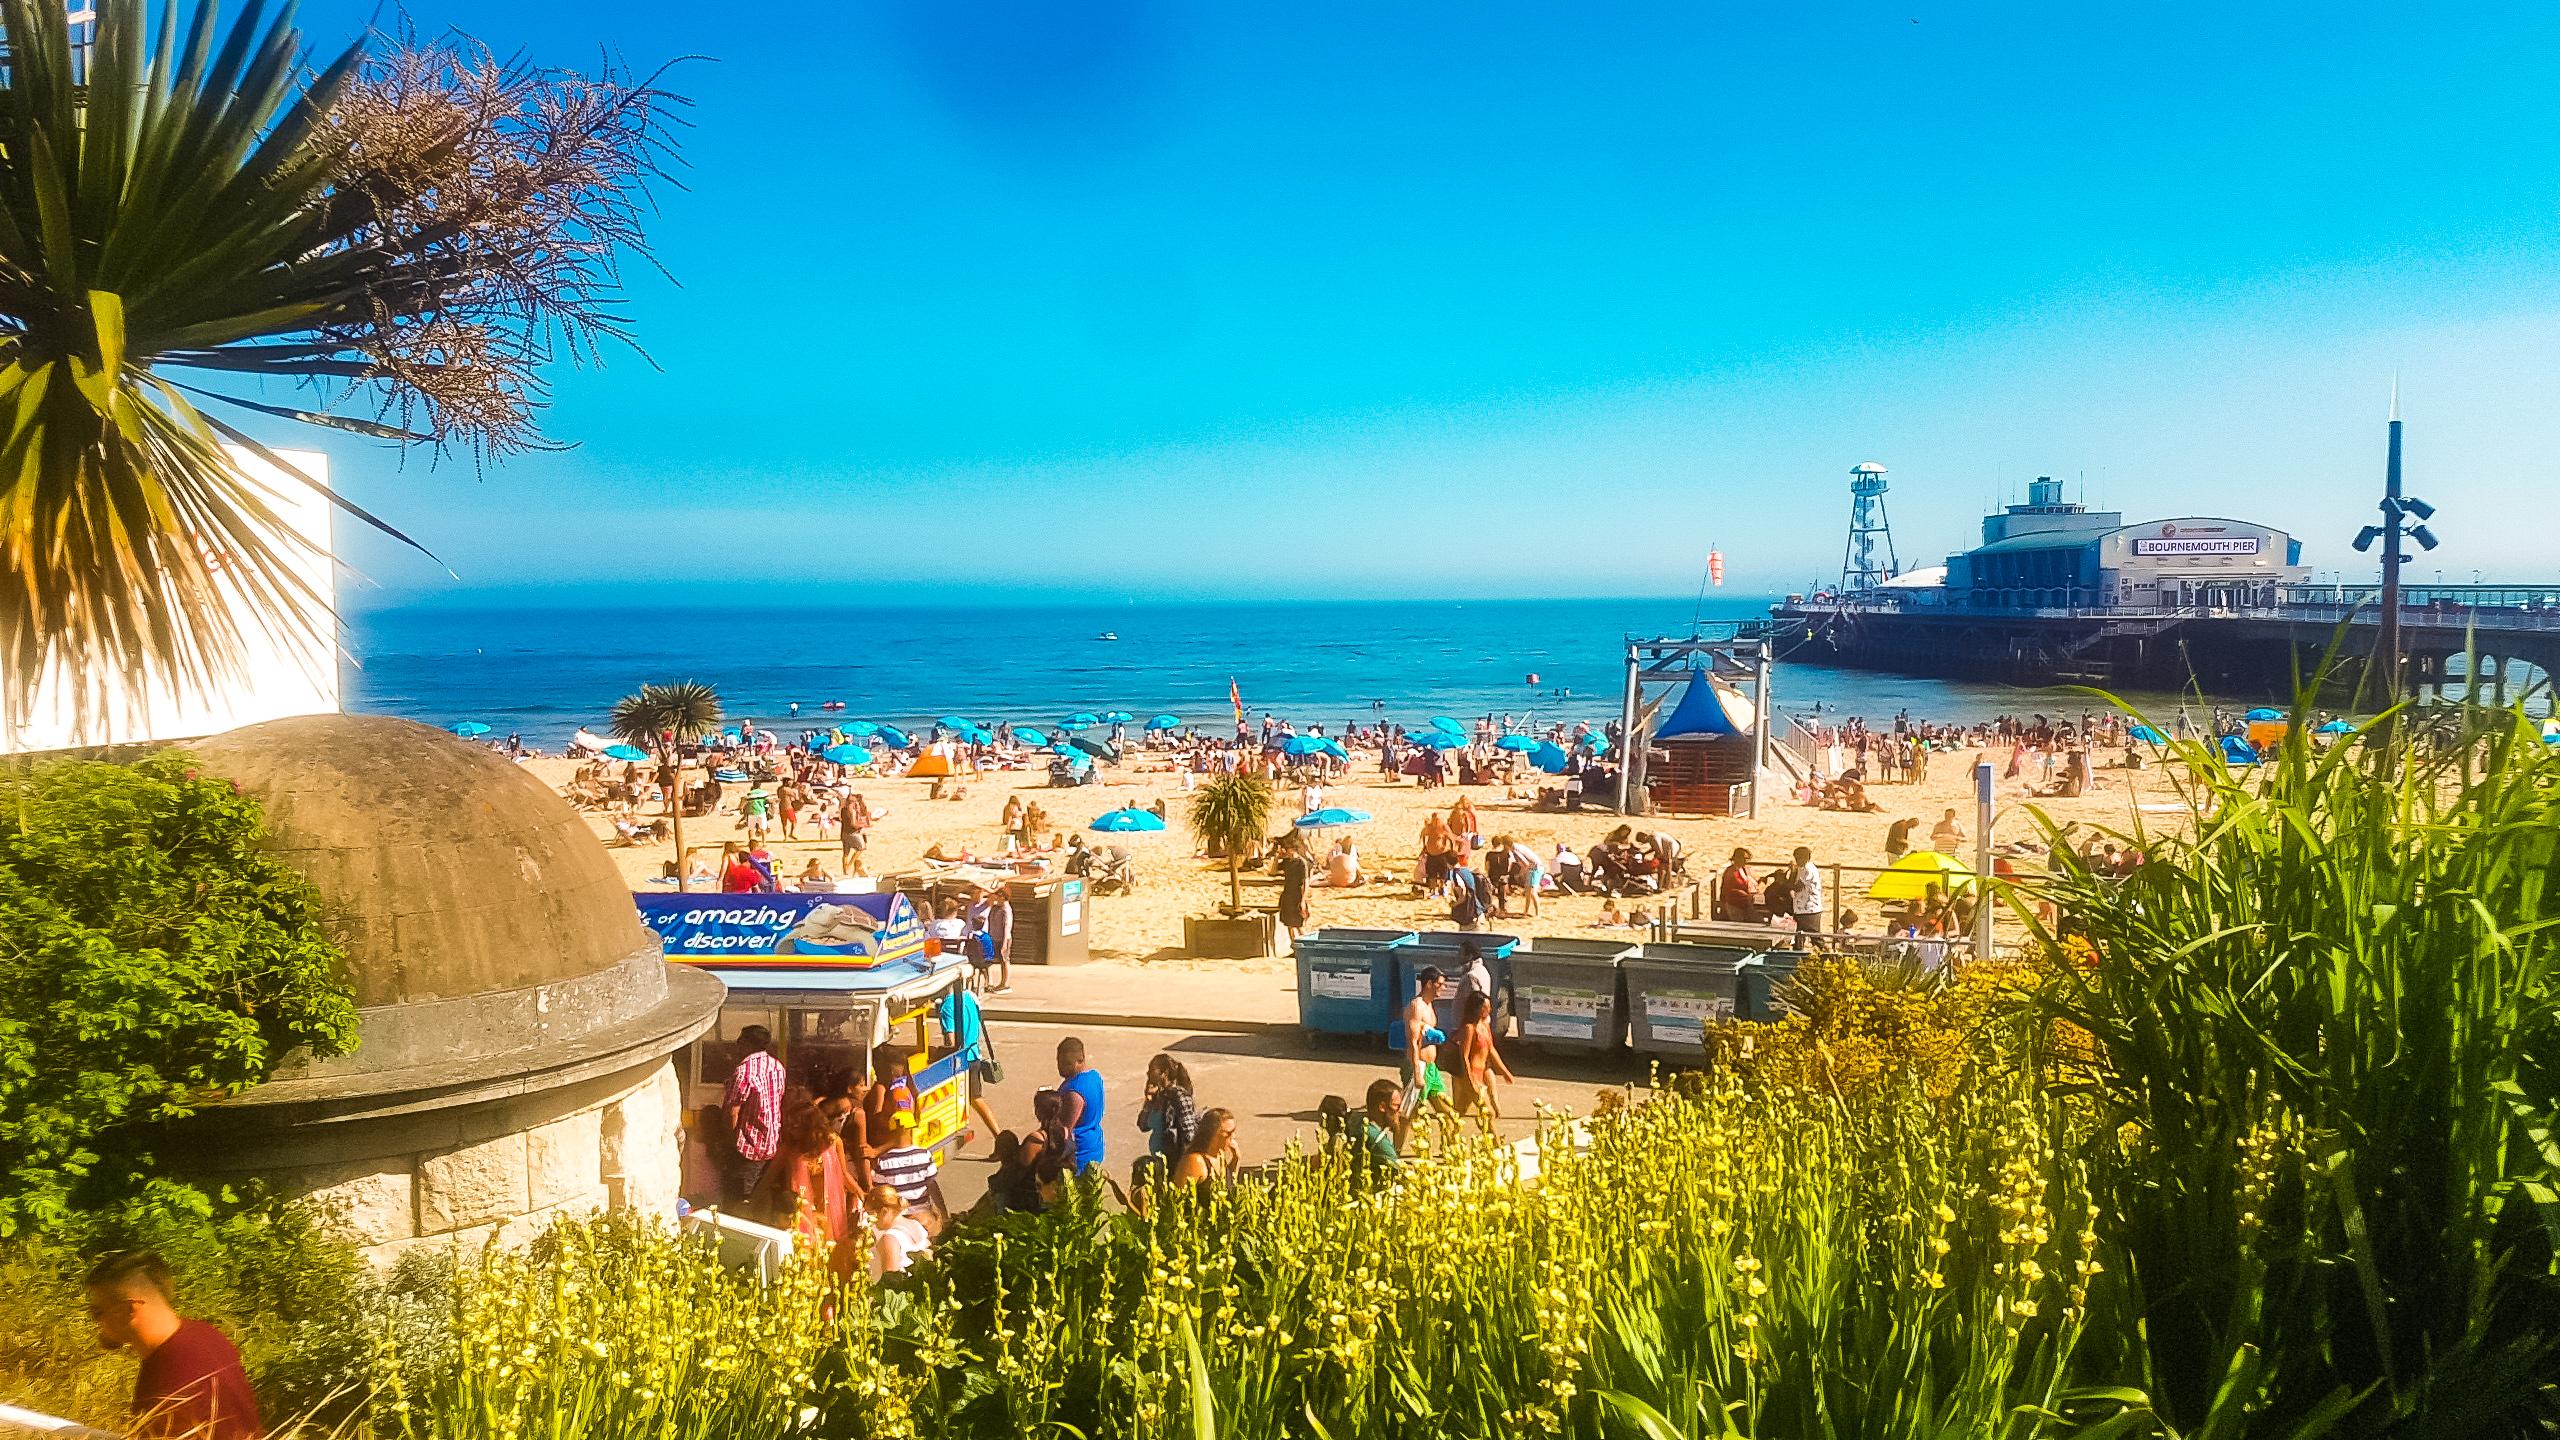 Bournemouth beach, Bournemouth, Dorset, Jurrassic coast, Dorset beach